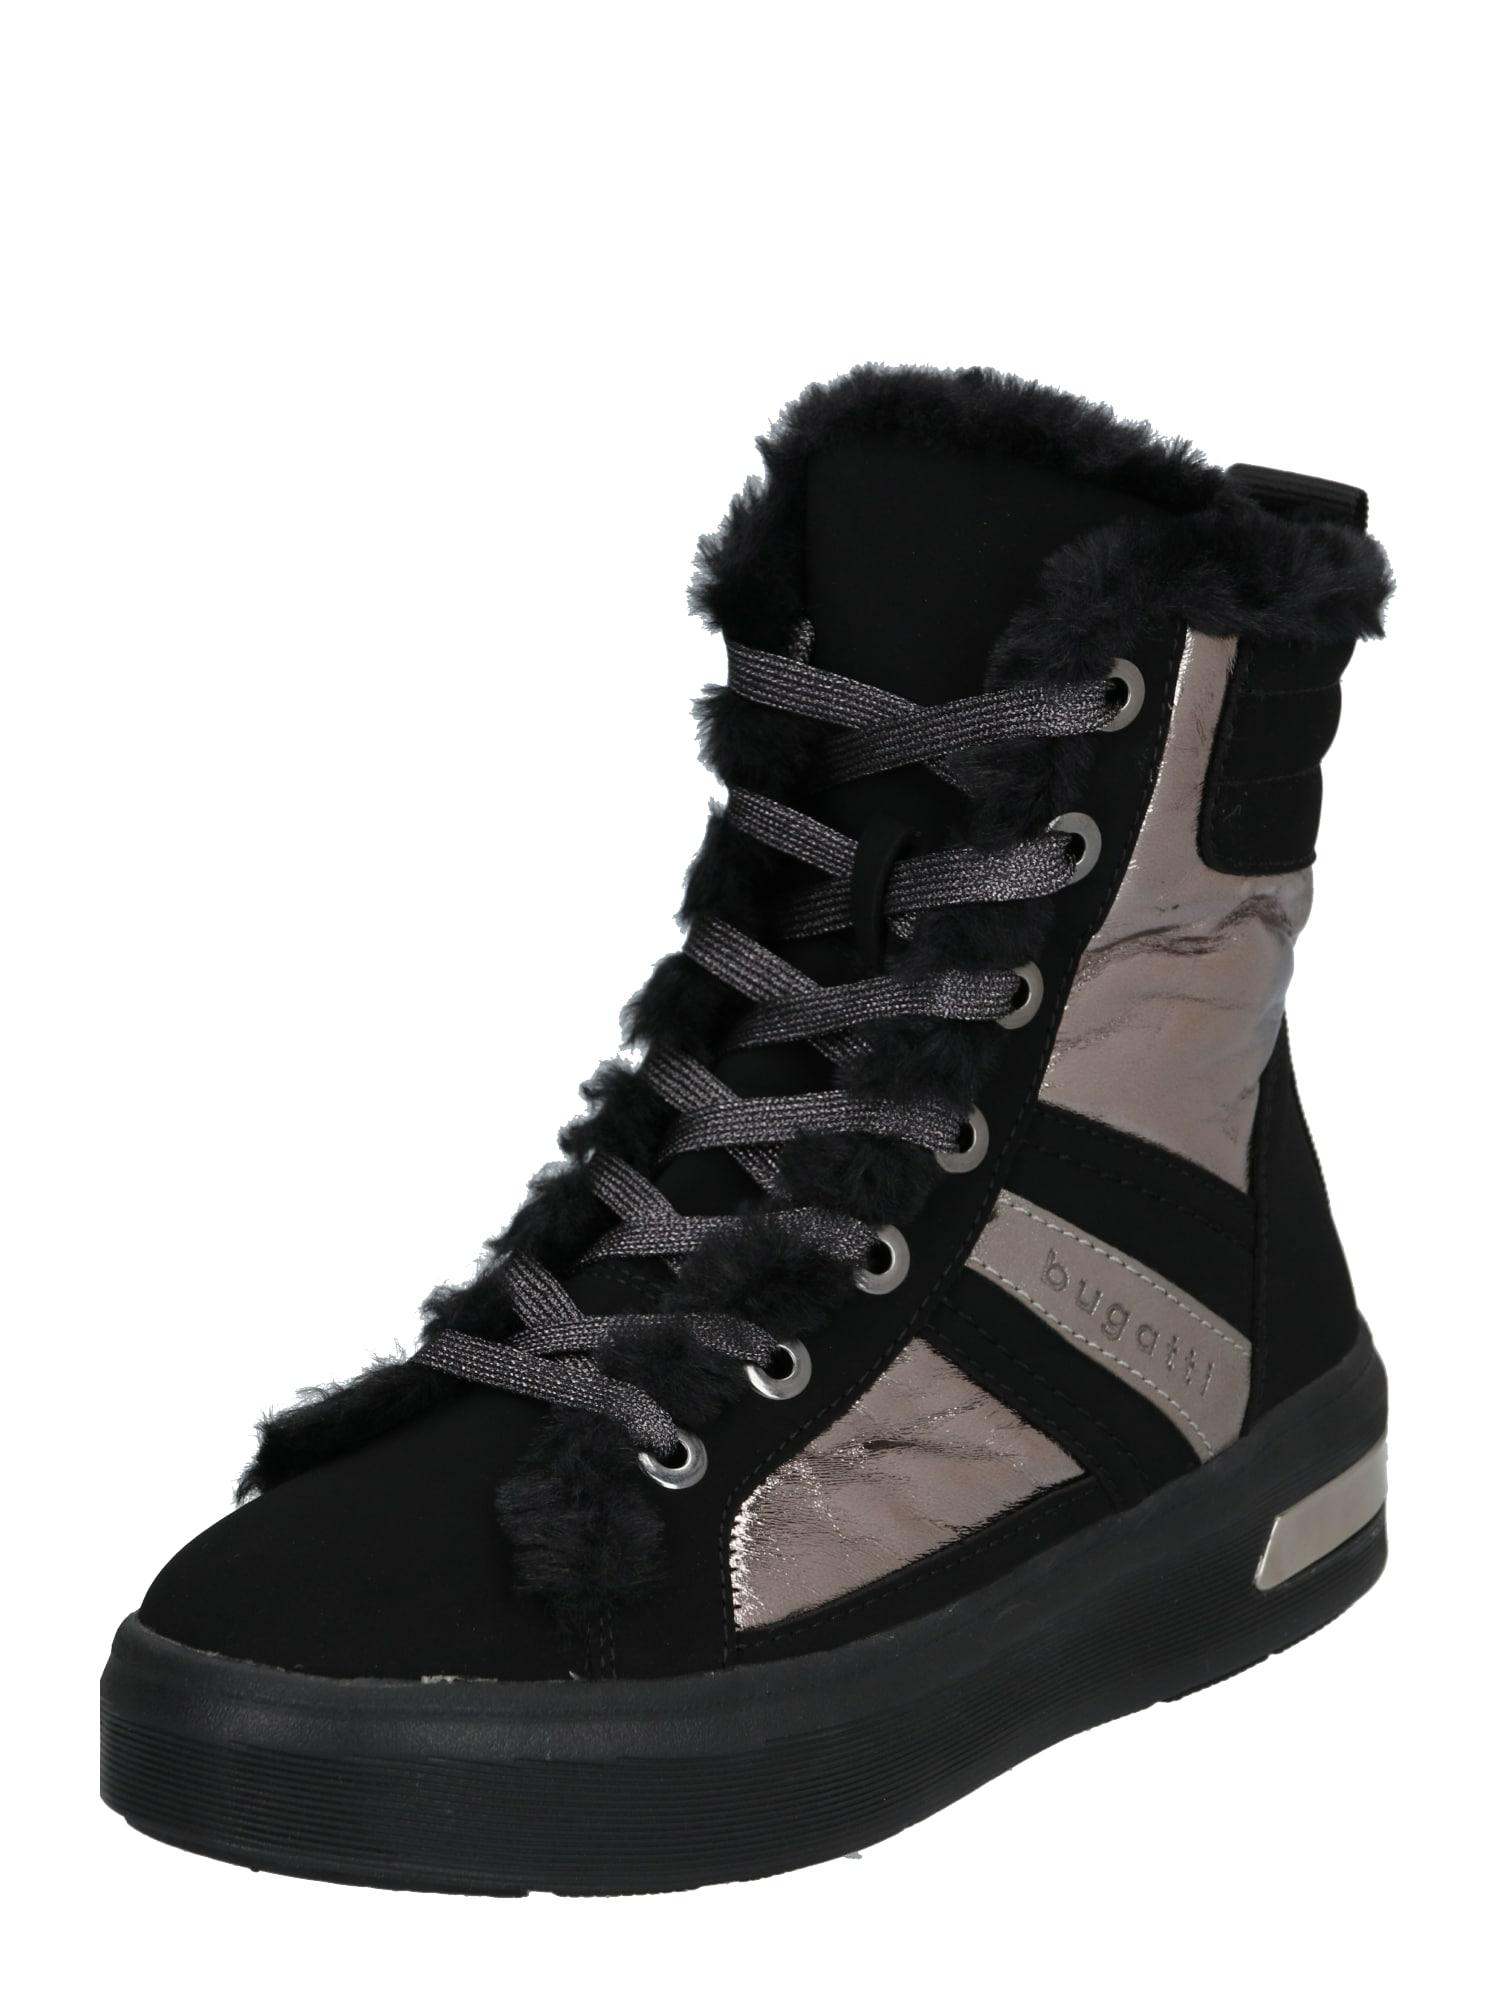 bugatti Auliniai batai su kulniuku 'Milka' juoda / sidabras